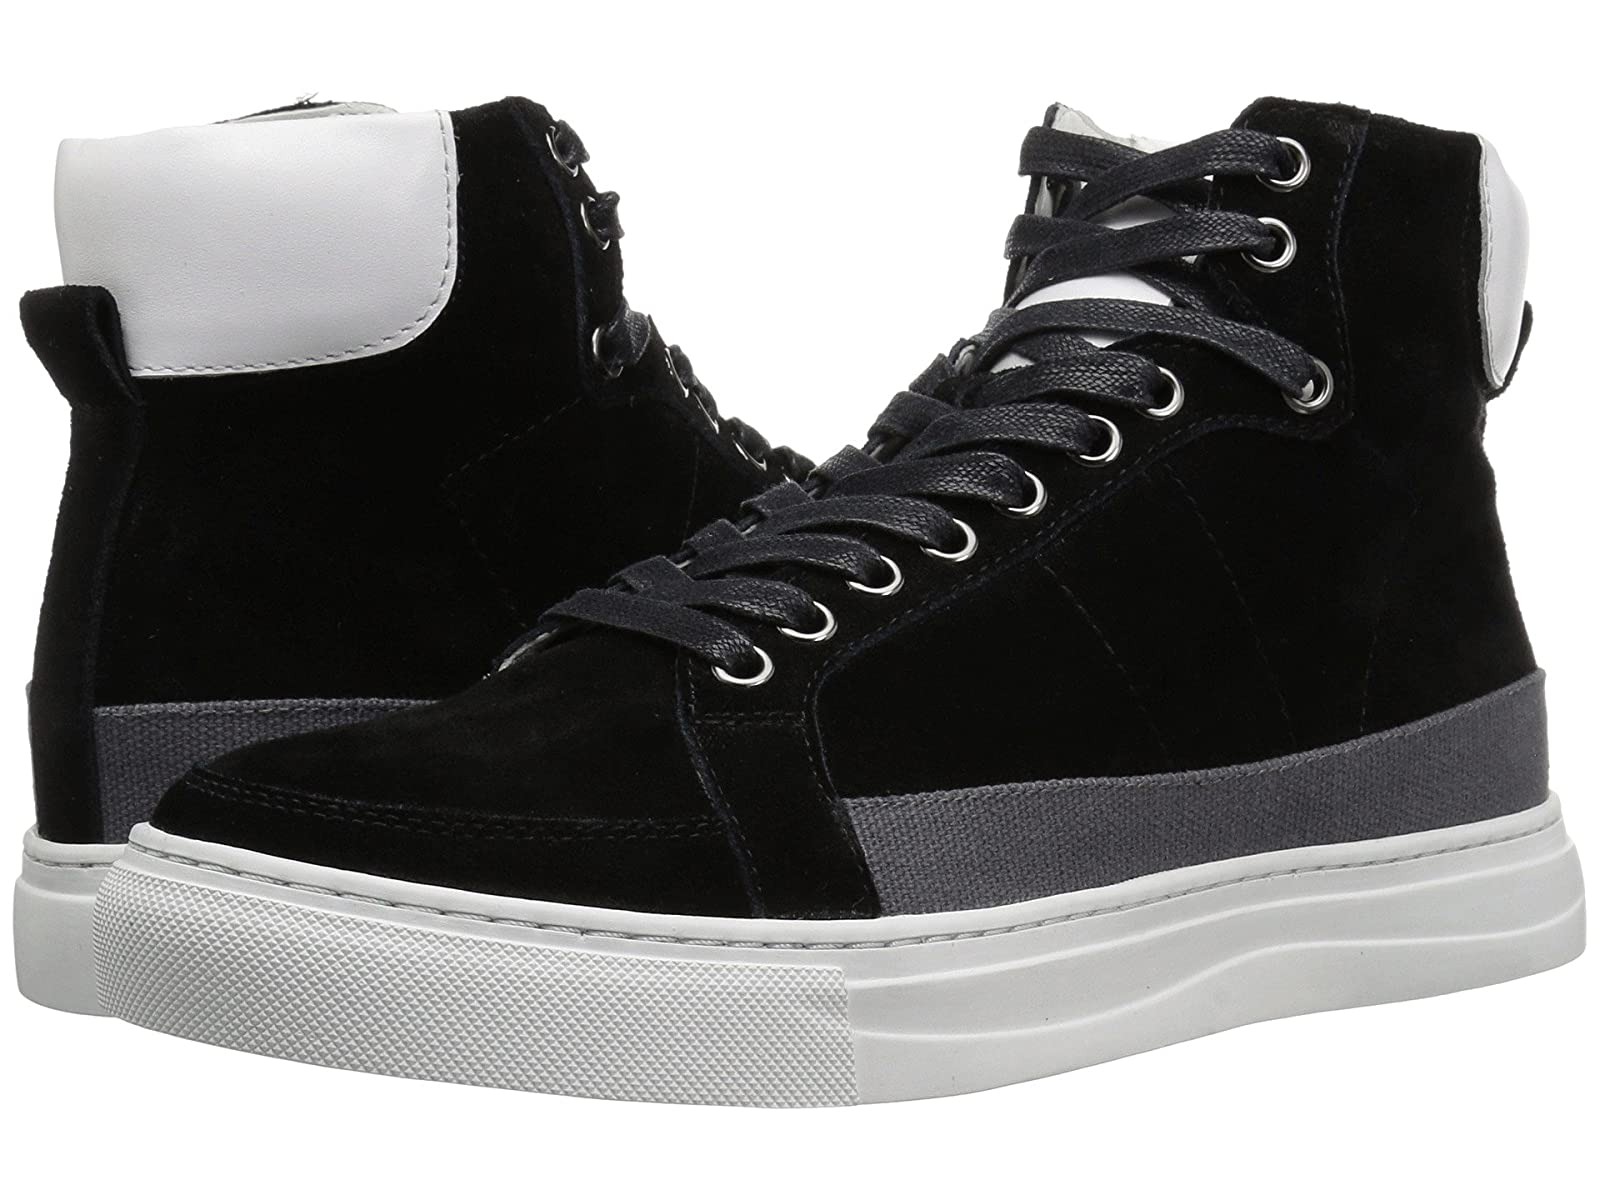 English Laundry HighfieldCheap and distinctive eye-catching shoes